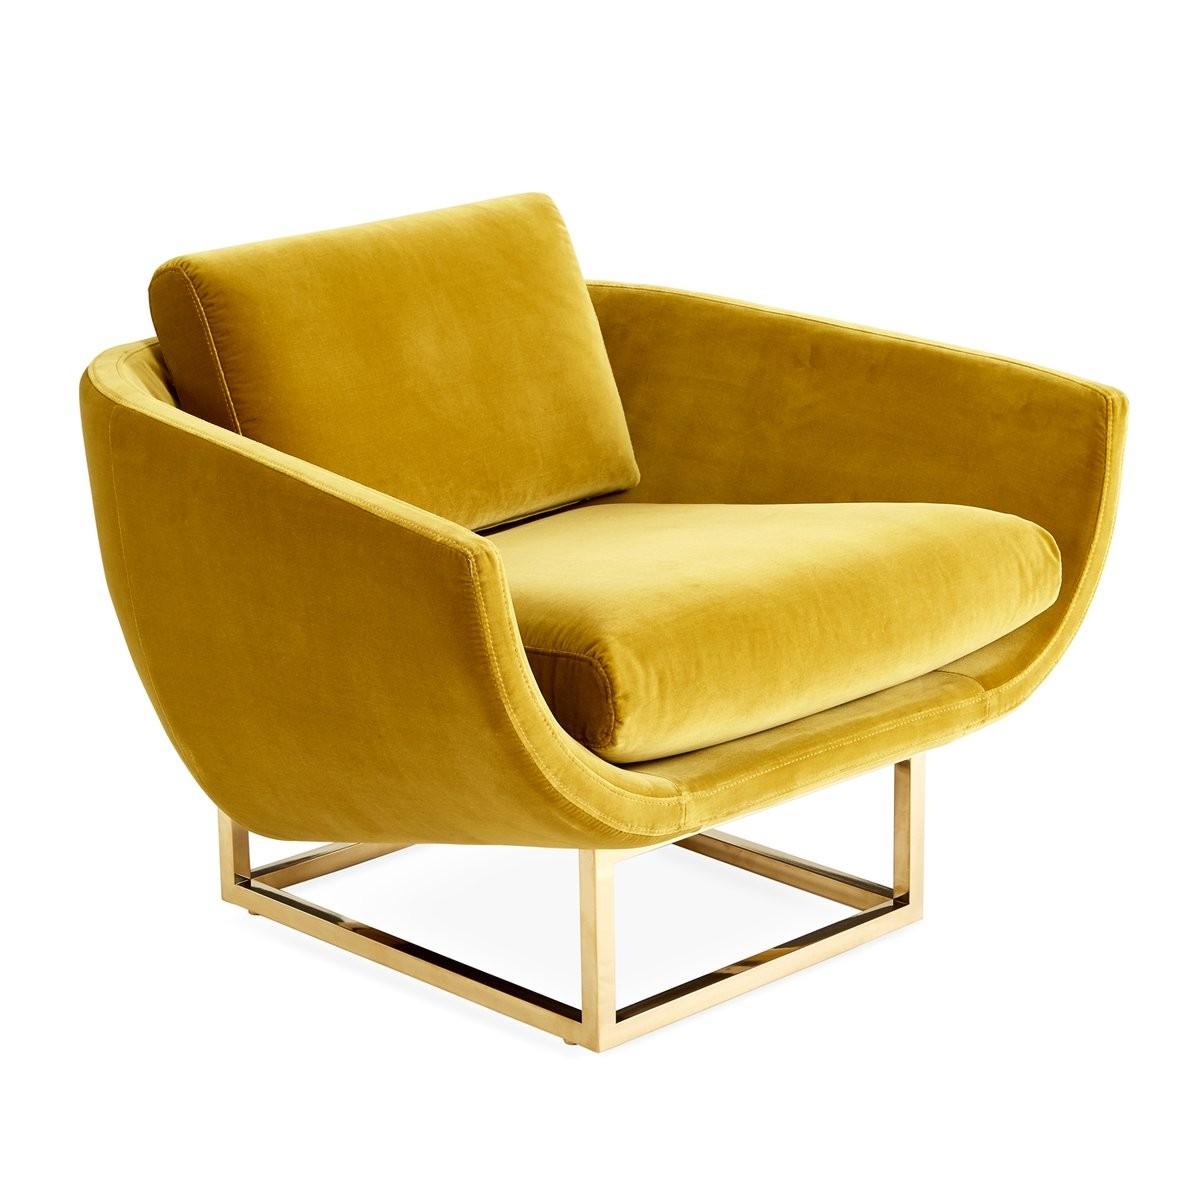 Jonathan Adler I Beaumont Lounge Chair